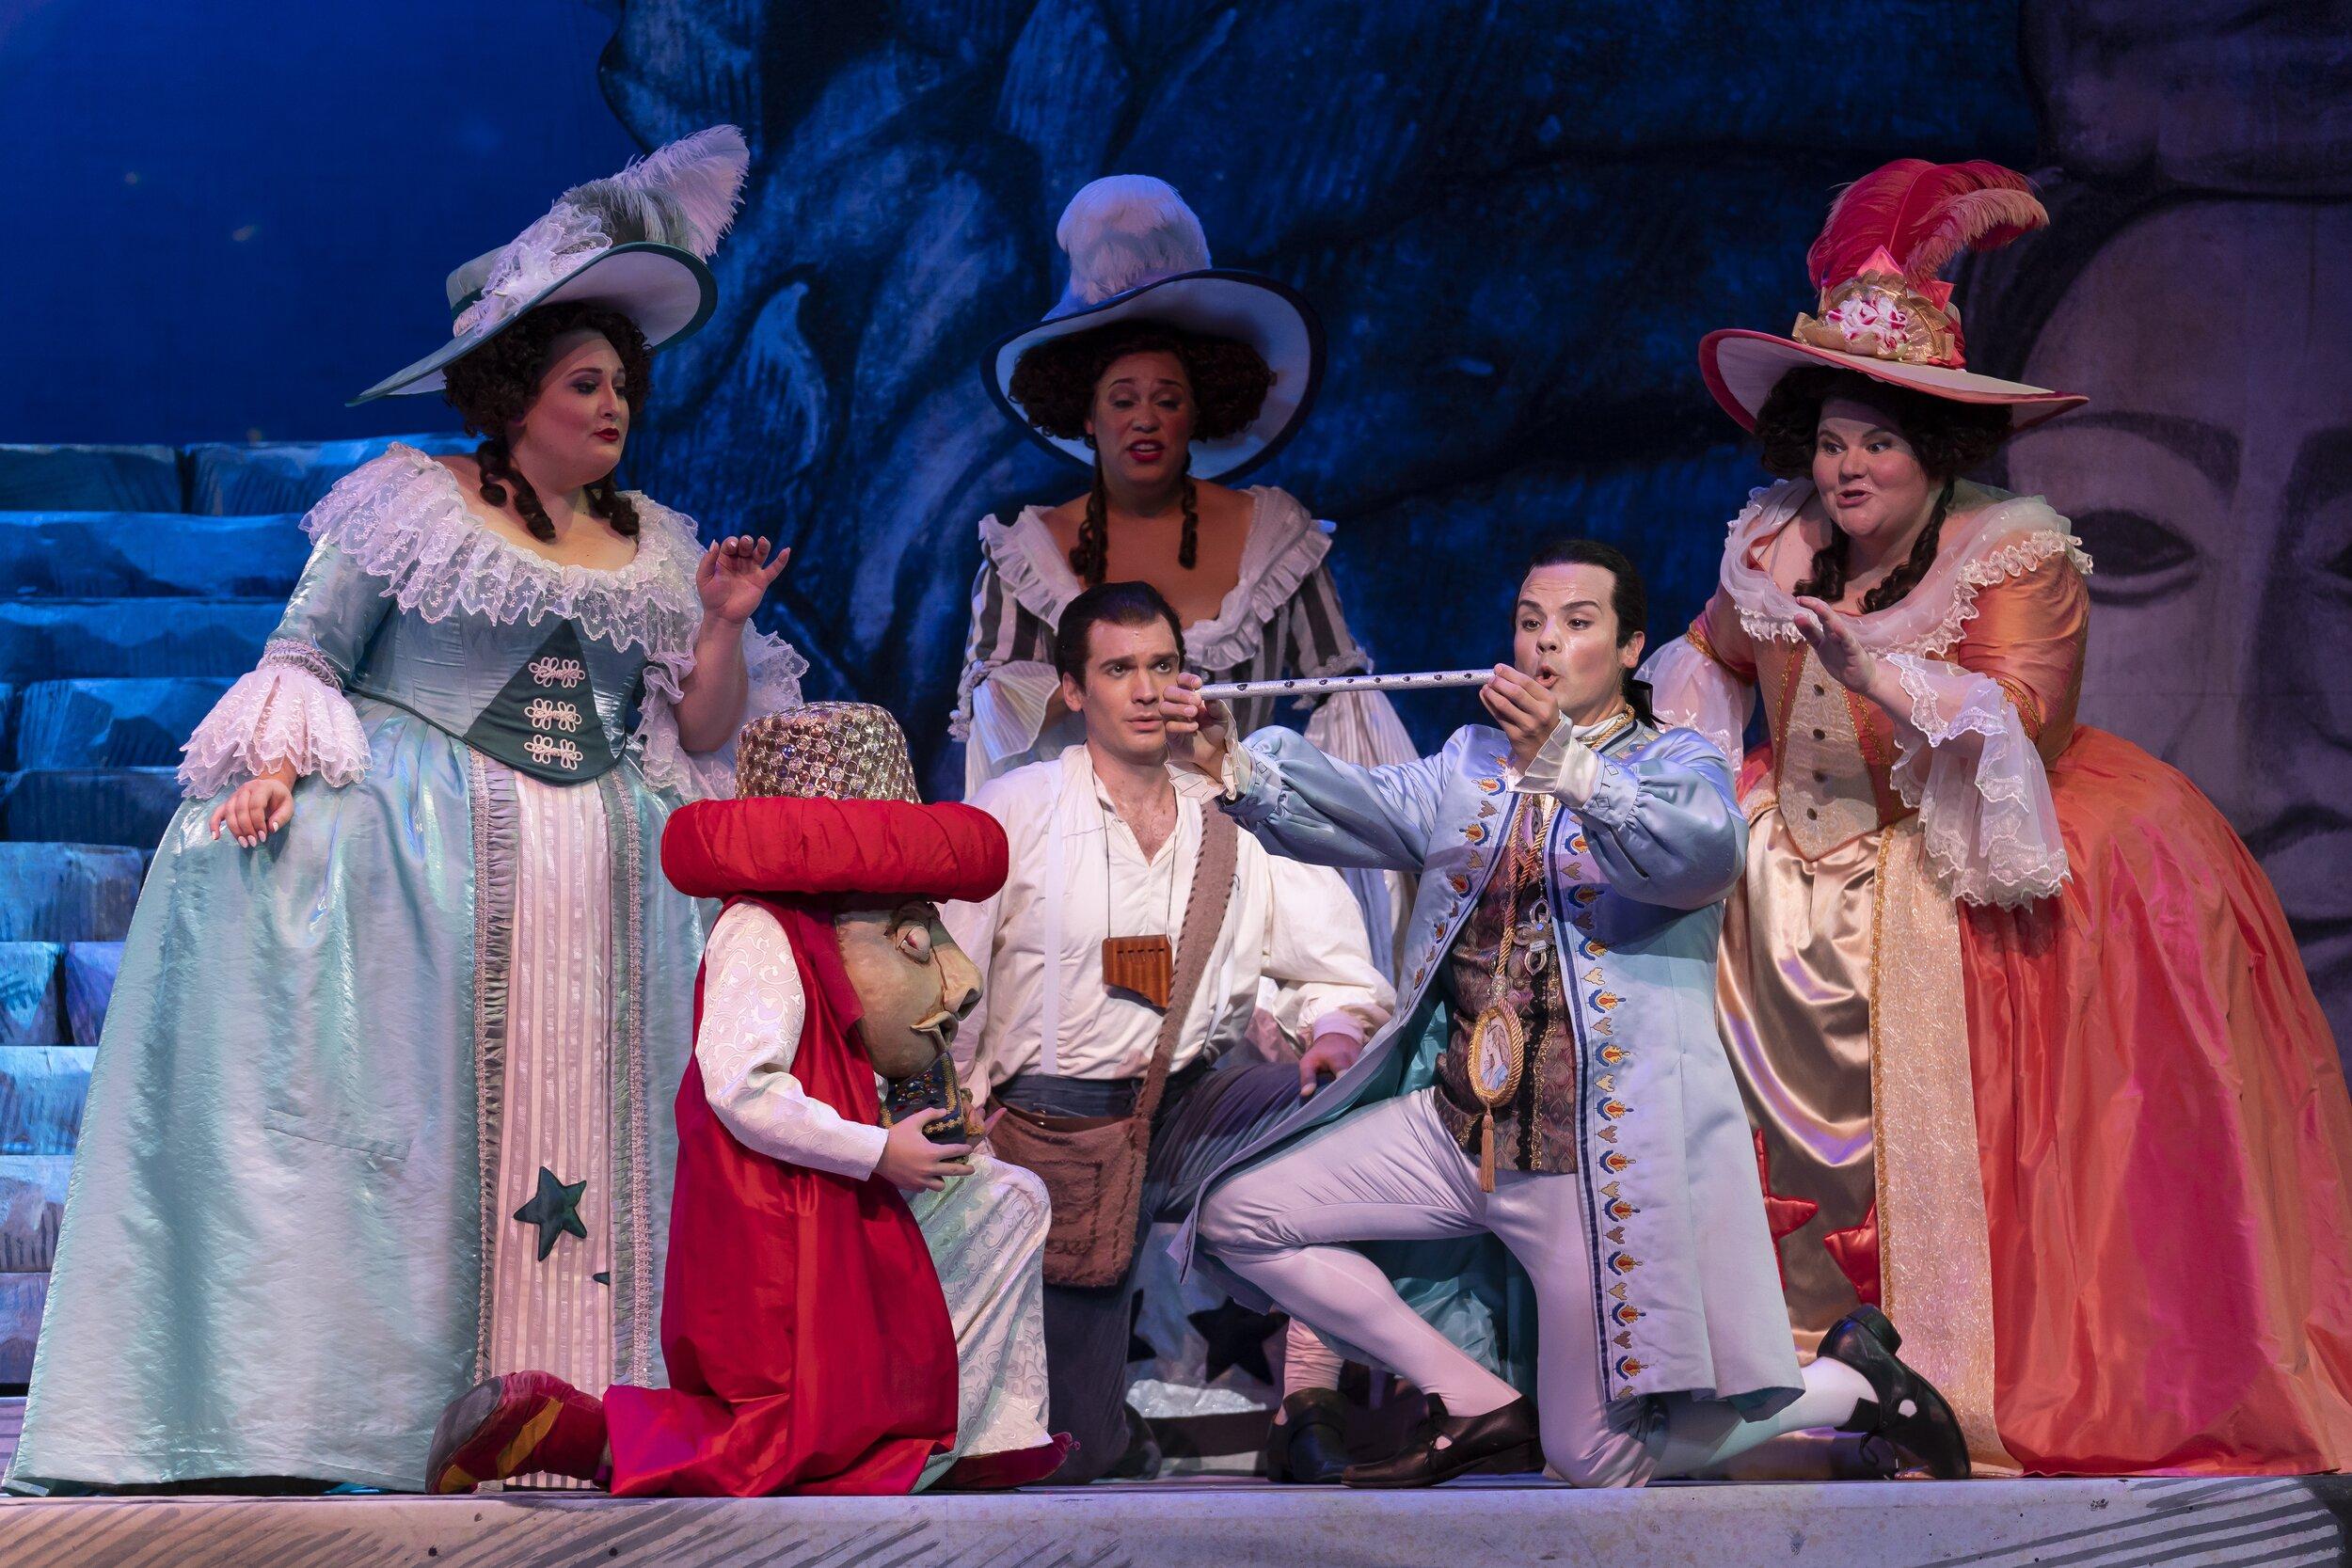 kneeling l to r : Michael Adams as Papageno and David Portillo as Tamino.  Standing :  l to r  the three ladies, Alexandria Shiner, Deborah Nansteel, and Meredith Arwady. Photo by Scott Suchman; courtesy of Washington National Opera.